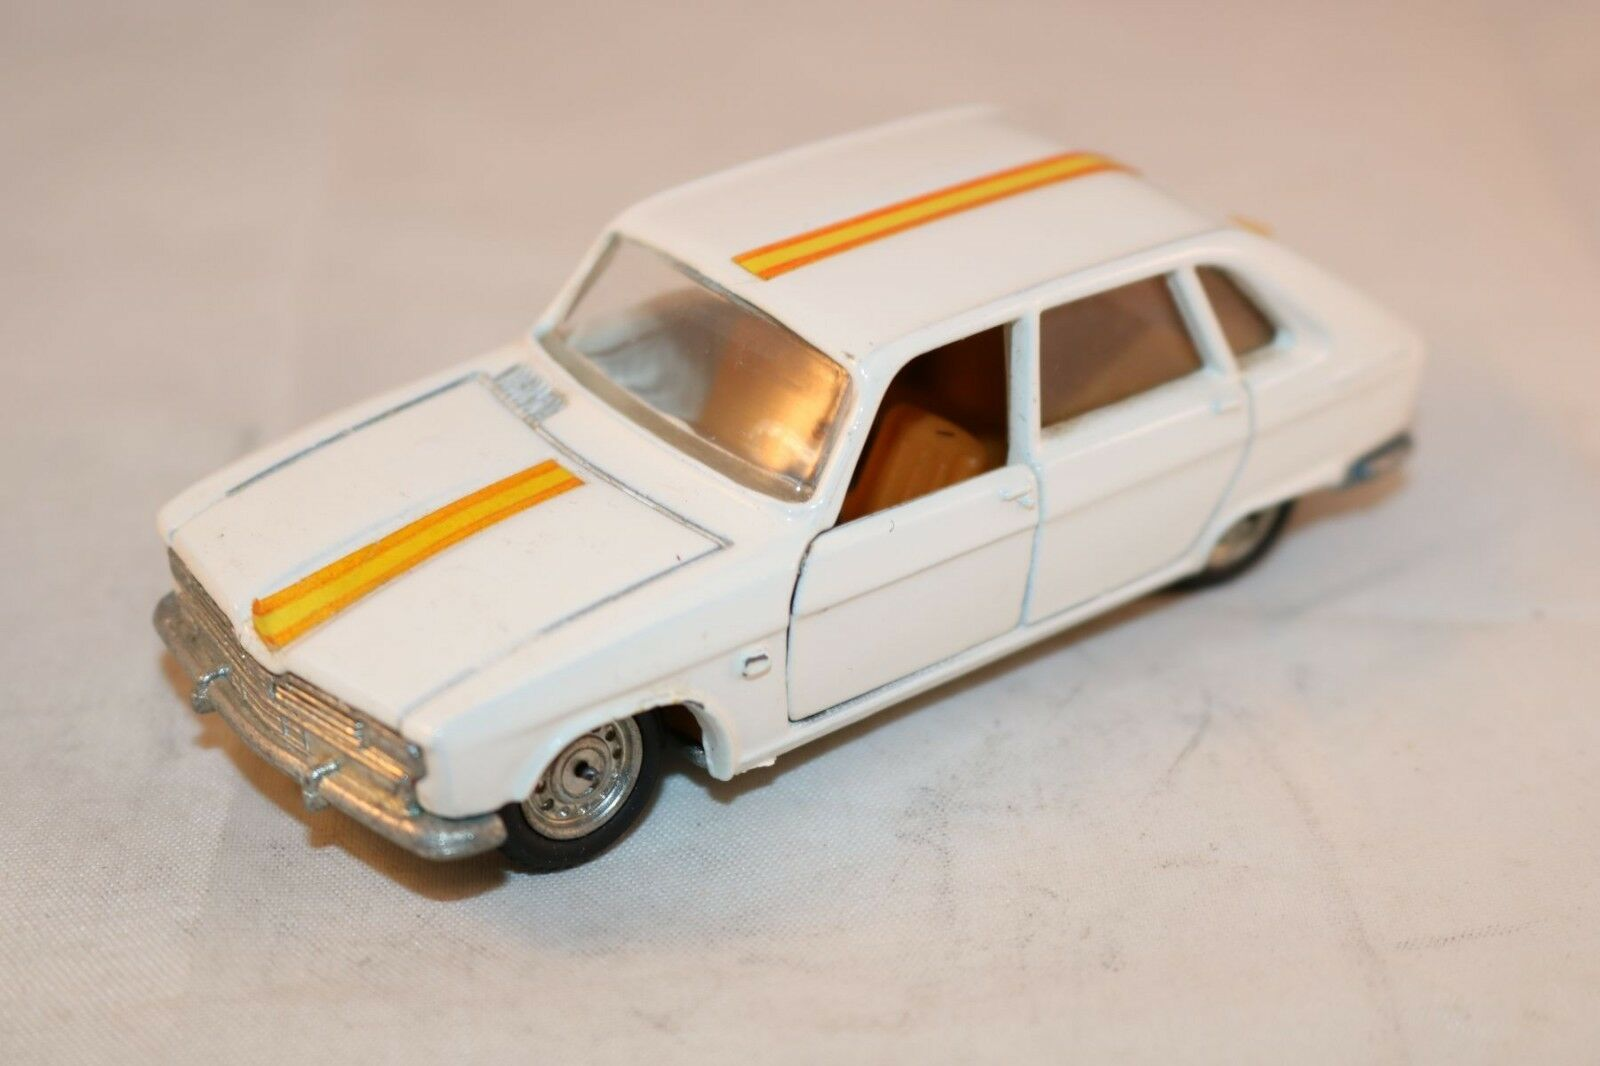 Politoys 579 Renault 16 very very near mint all original condition rare raro